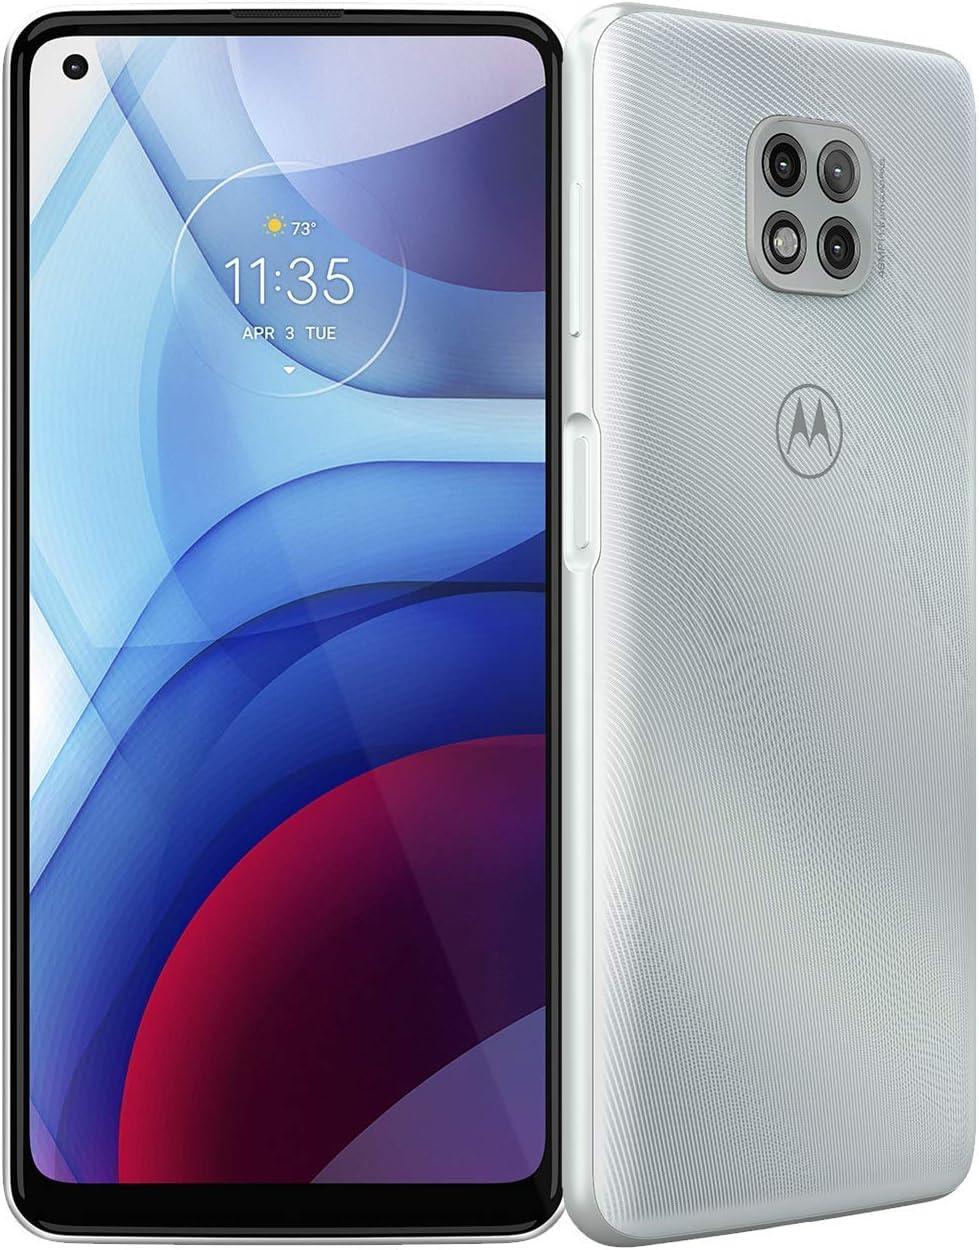 Unlocked Motorola Free shipping anywhere in the nation G Power - Rene Flash Gray PALF0005US 64GB Free Shipping New